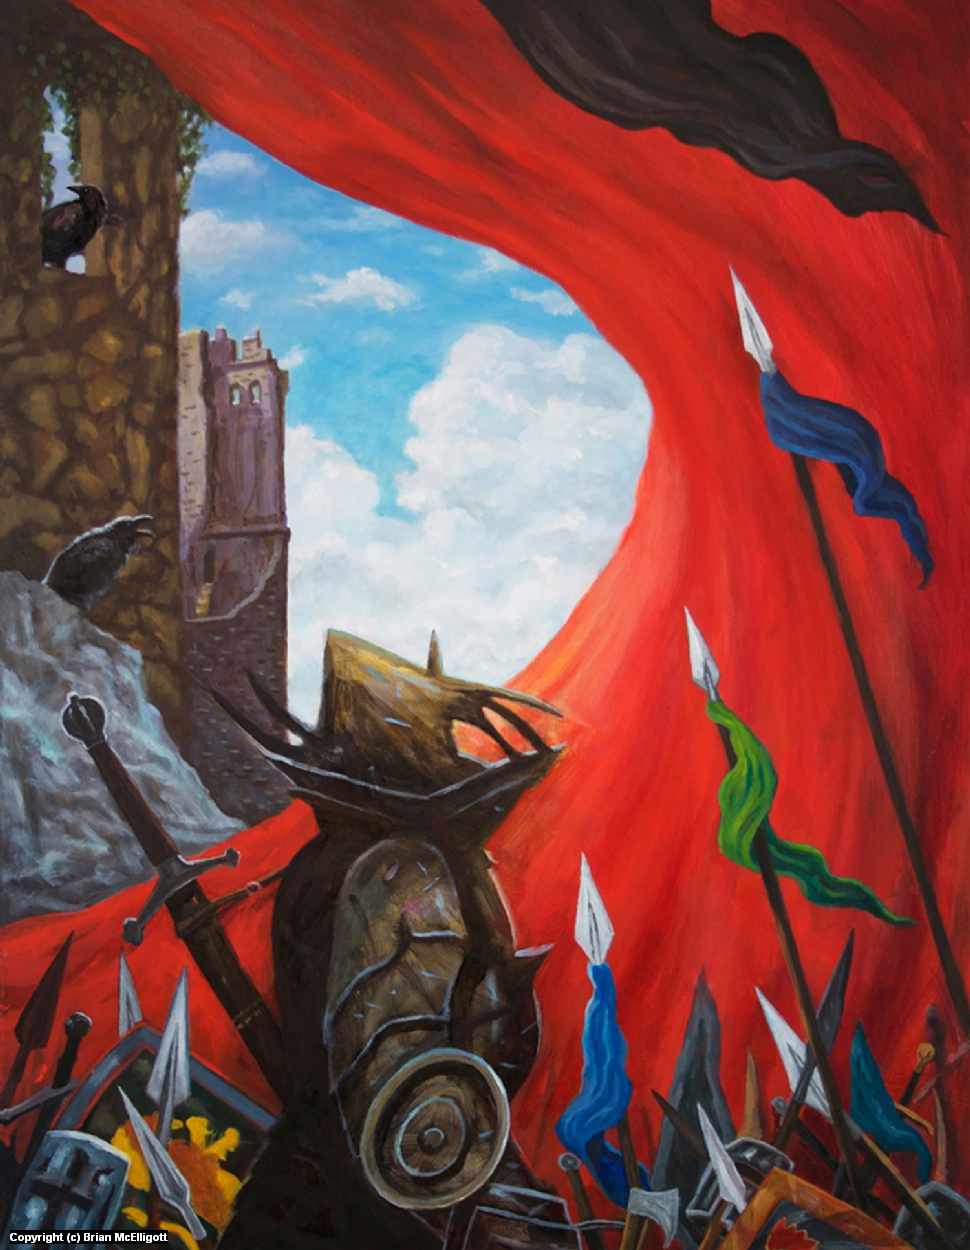 The Black Knight Artwork by Brian McElligott